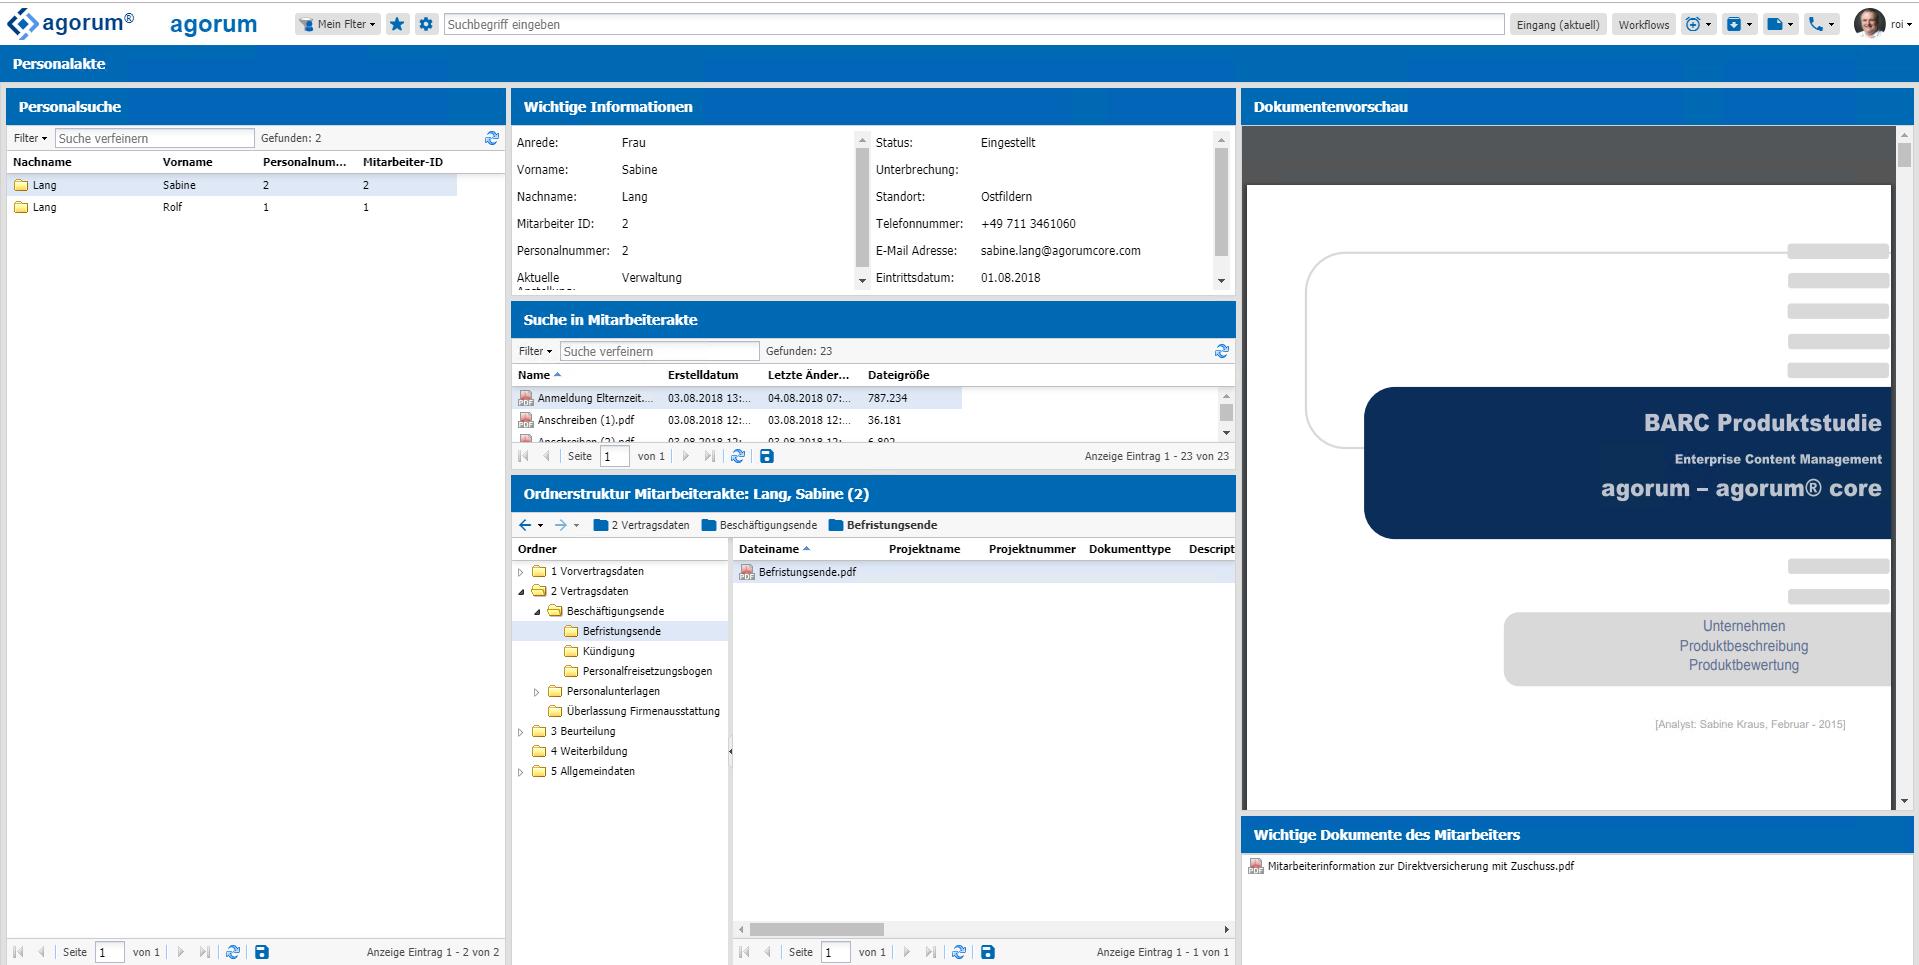 agorum core smart folder dynamische Ordnerstru